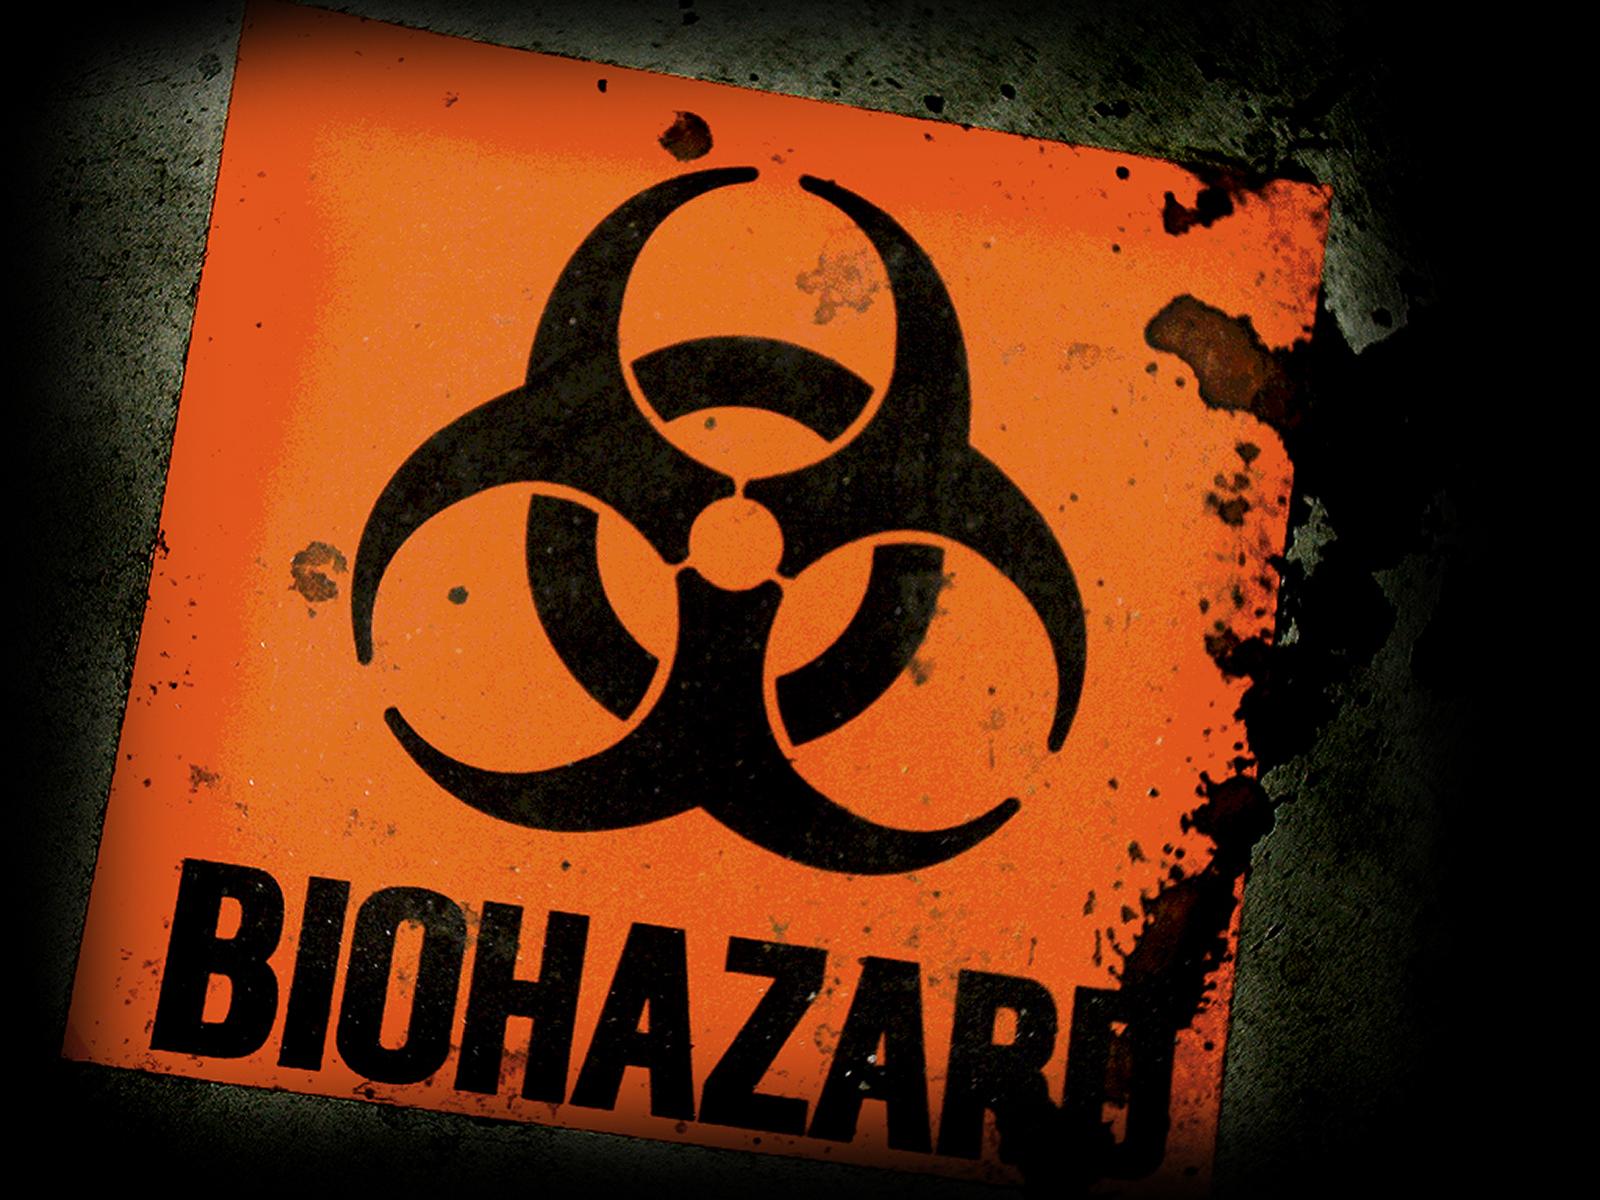 Biohazard Warning Signs Logo HD Wallpapers Download Wallpapers in 1600x1200